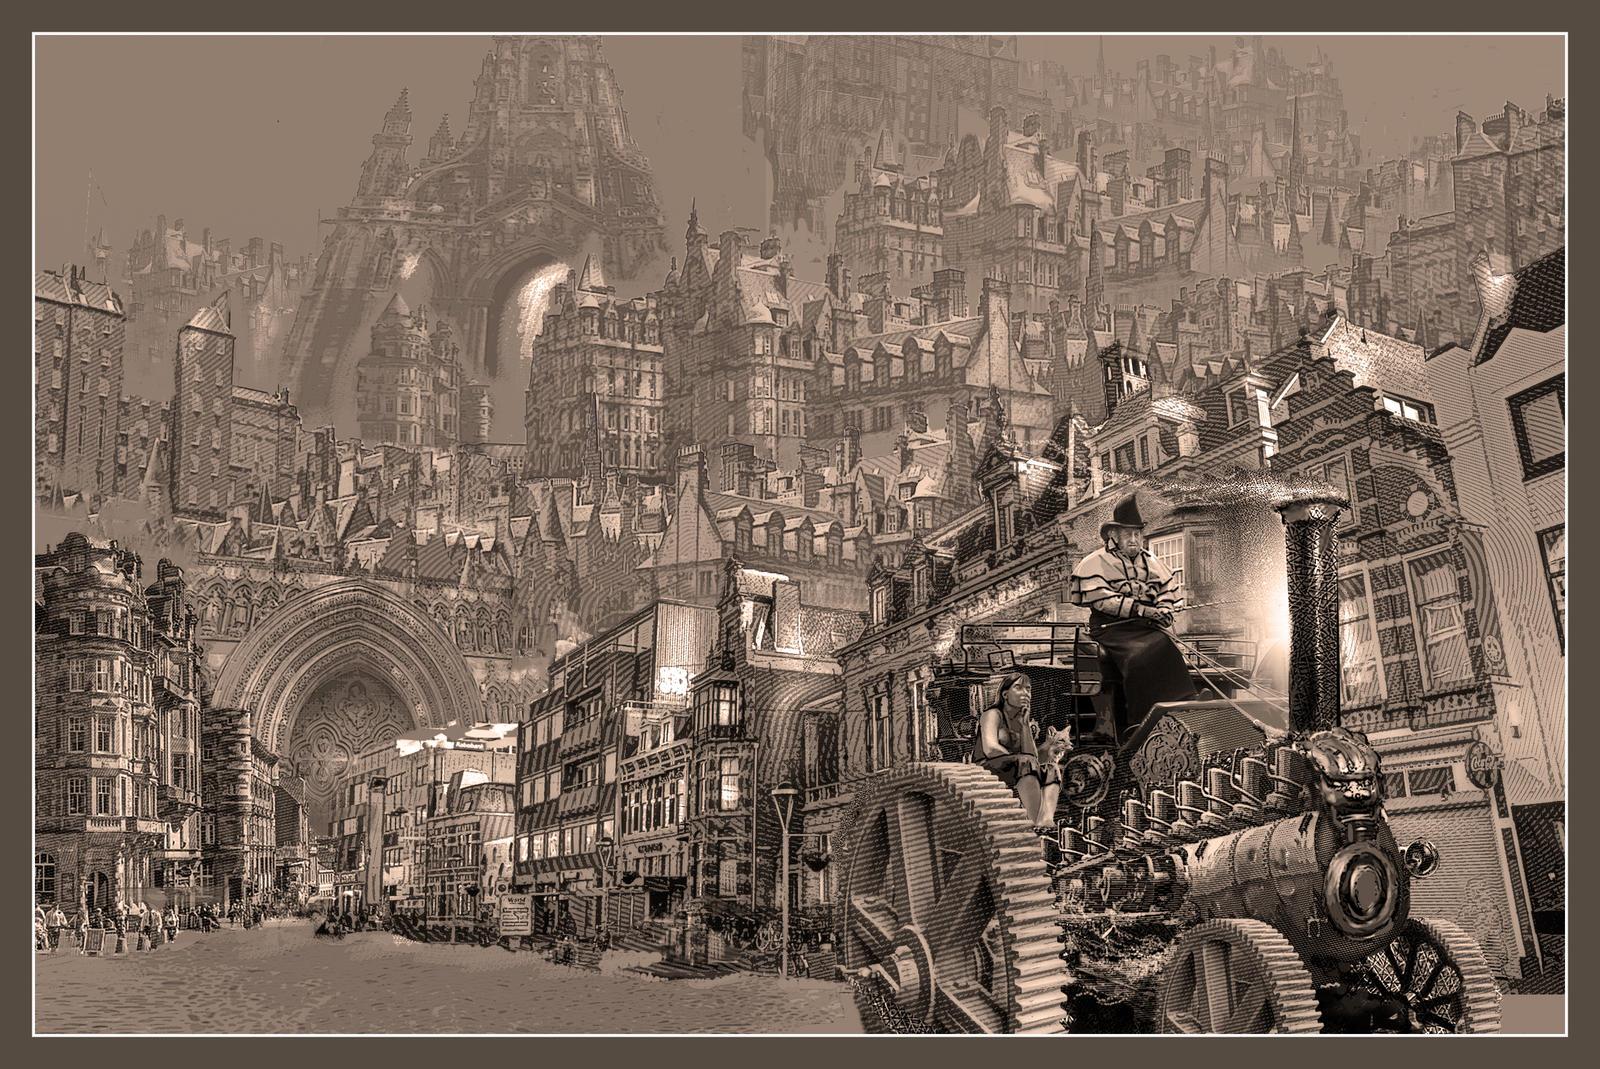 Huy Jorsaleem, steampunk city by taisteng on DeviantArt